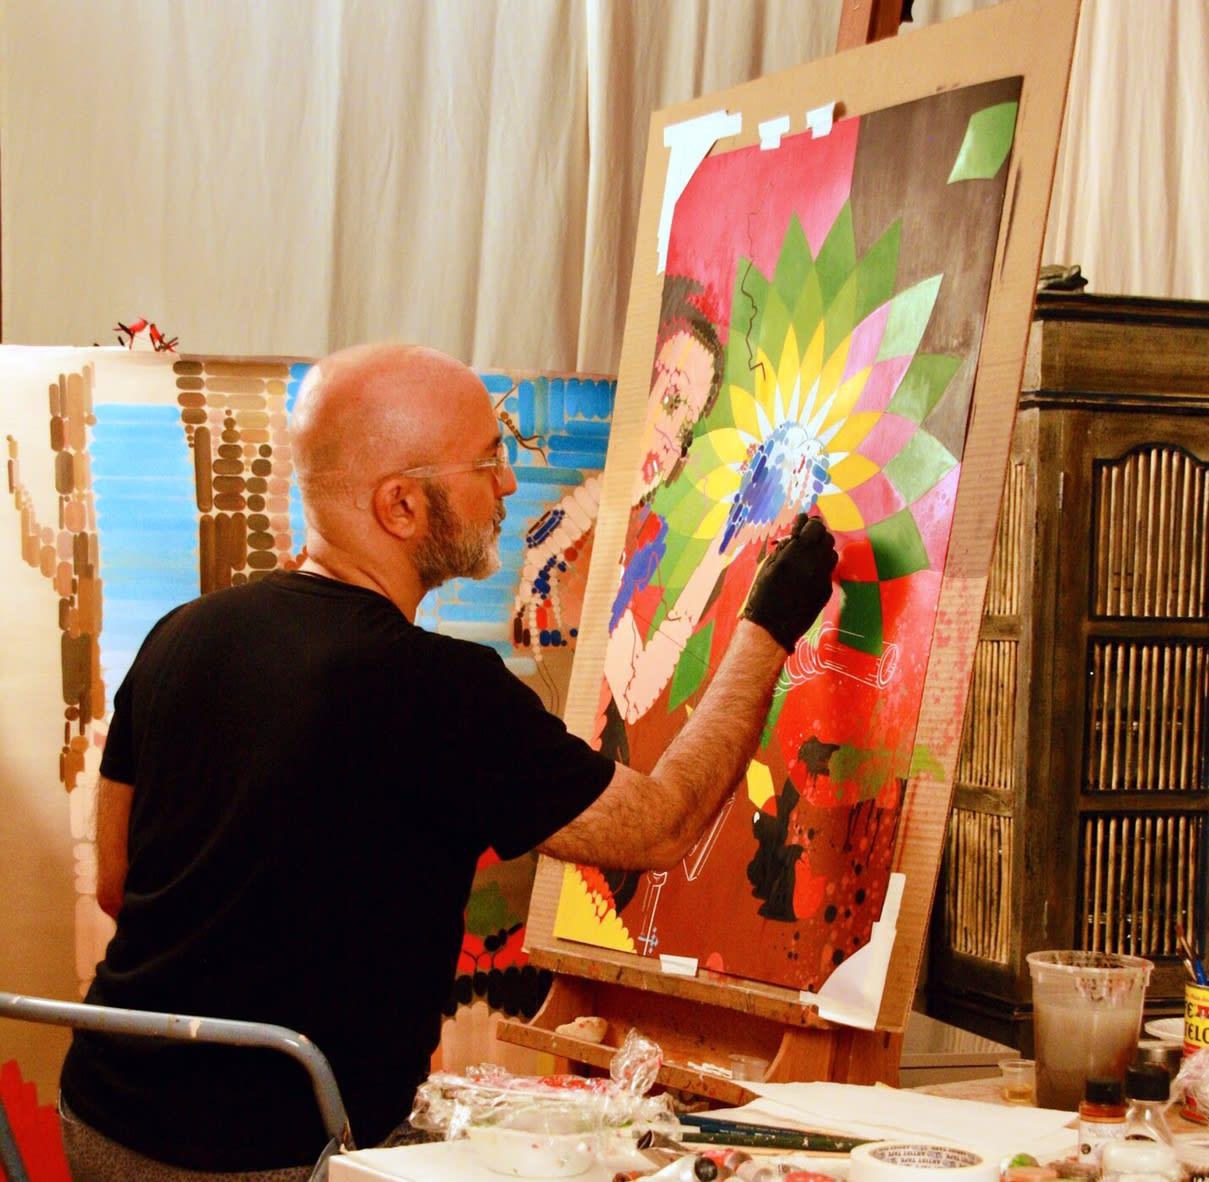 Labbauf at work in his studio